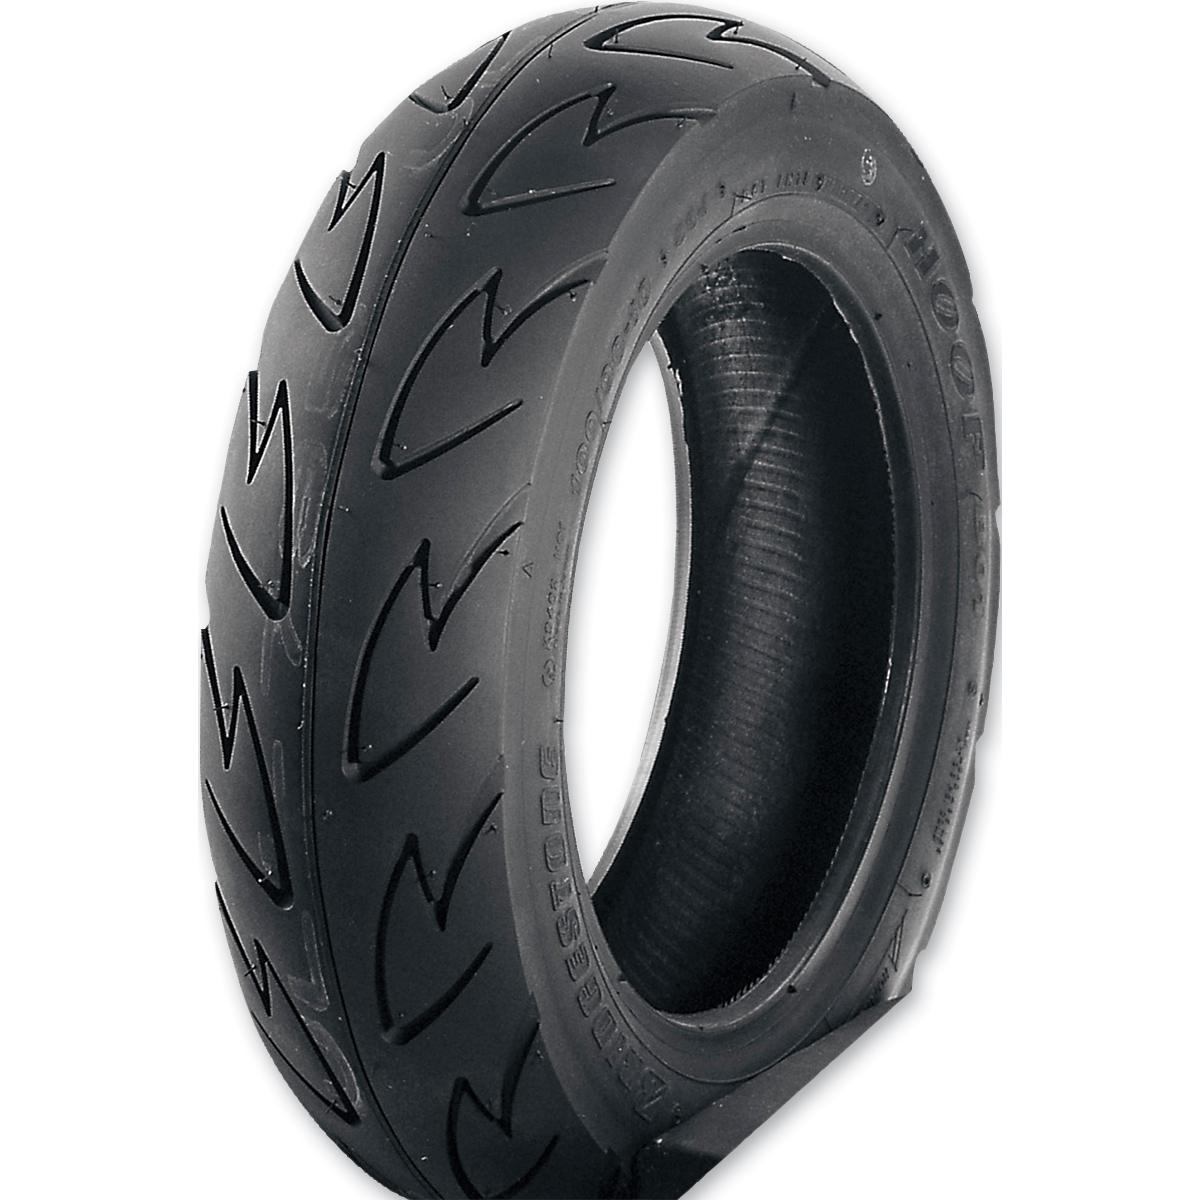 Bridgestone B01 HOOP 2.75-10 Front/Rear Tire